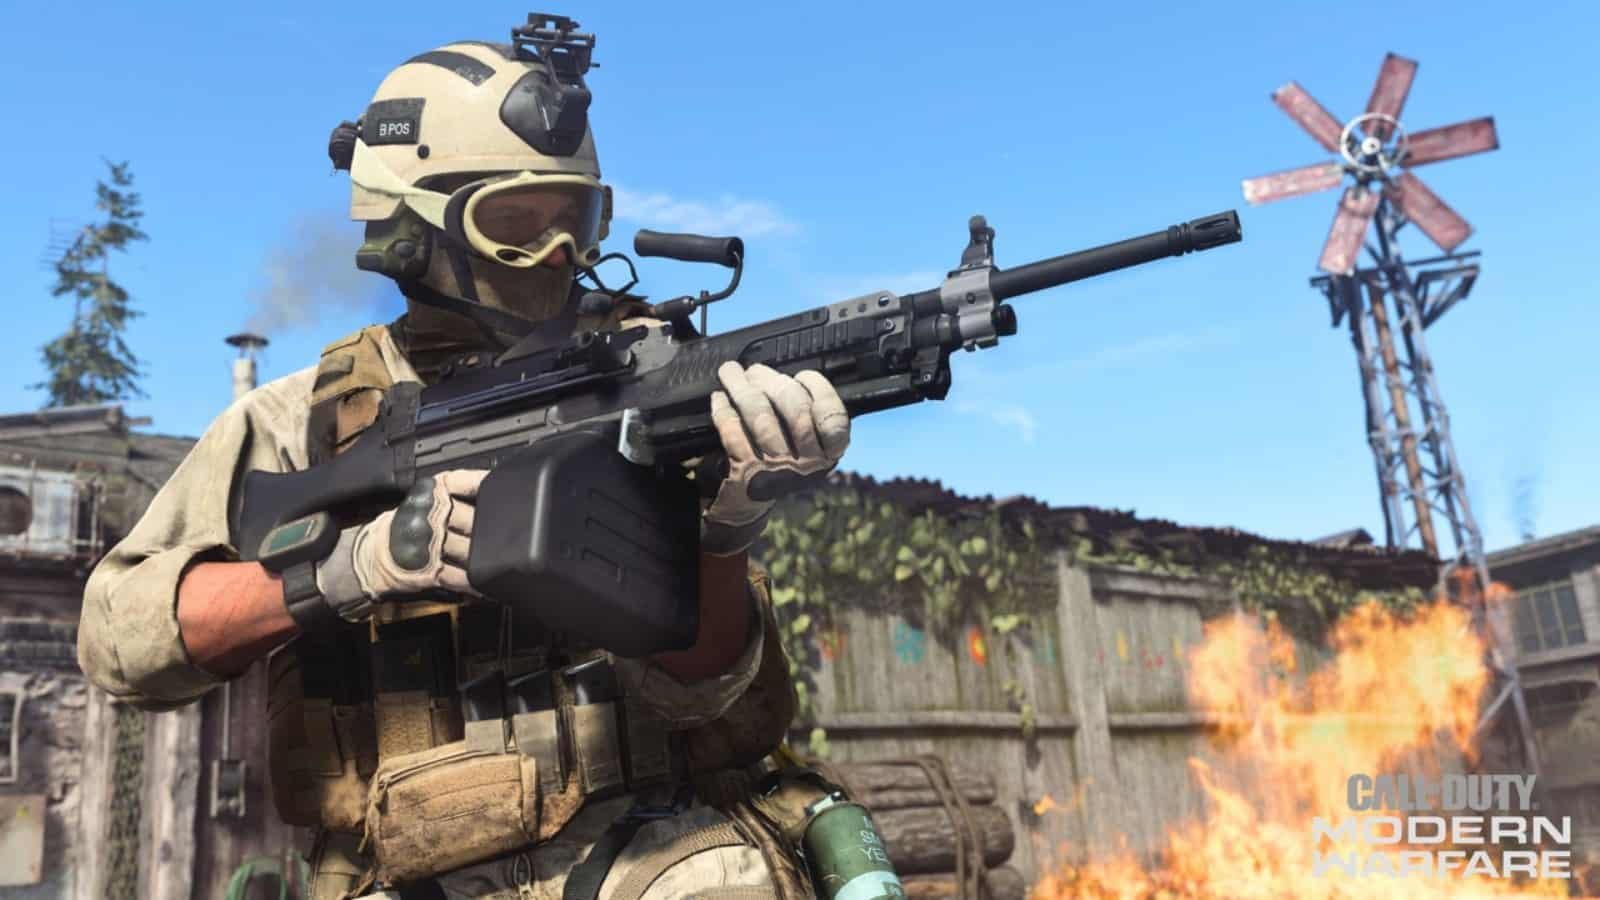 COD Warzone Best LMGs: Top 5 Light Machine Guns in Call of Duty